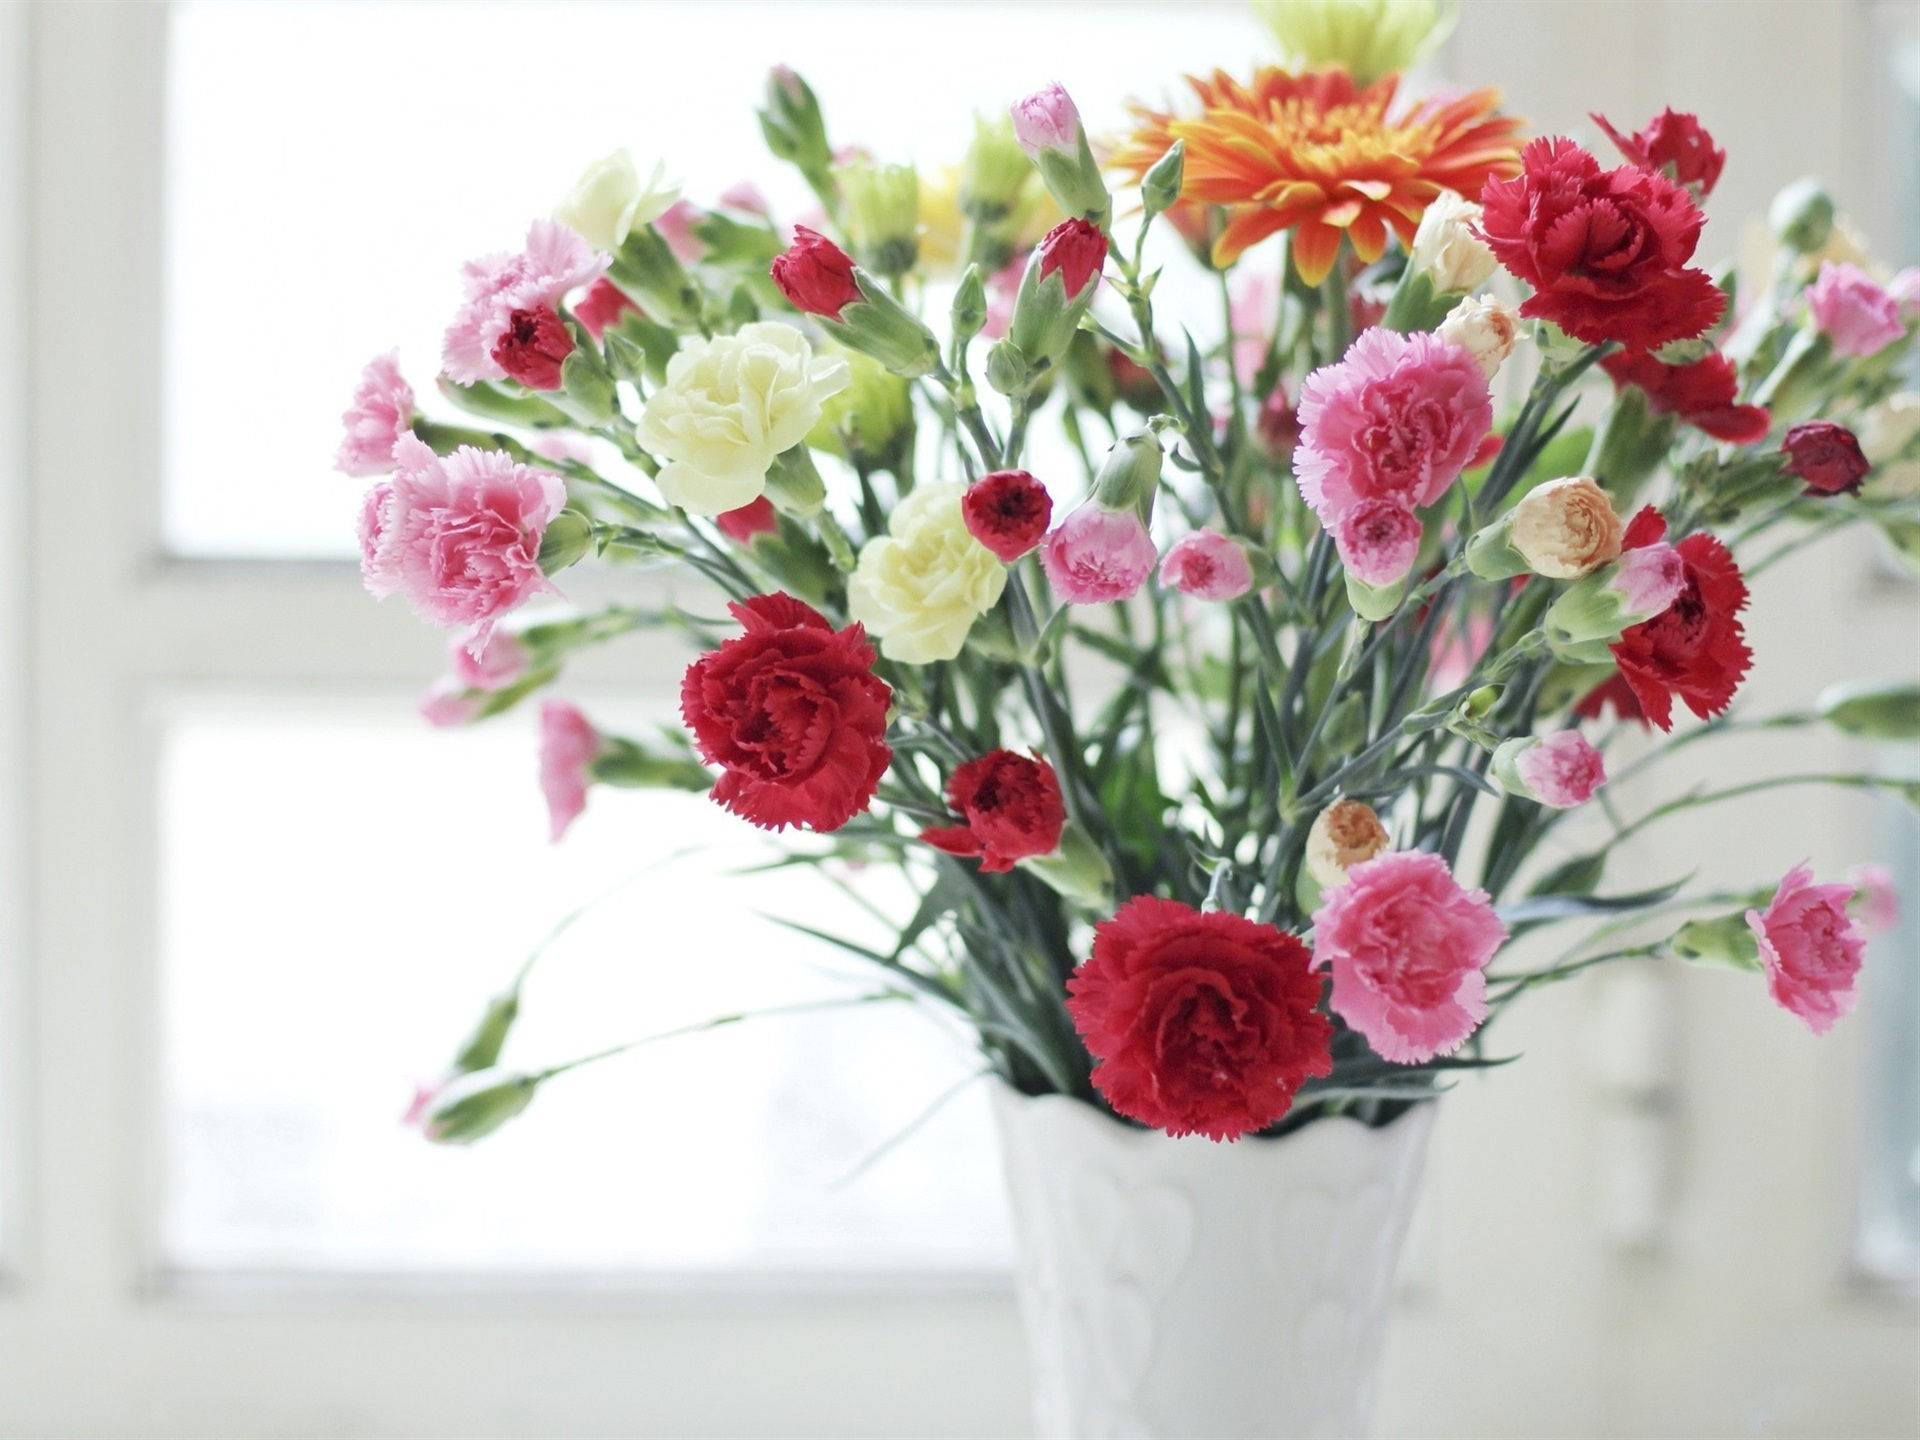 Fondos De Pantalla Claveles, Rosa, Rojo, Blanco, Flores